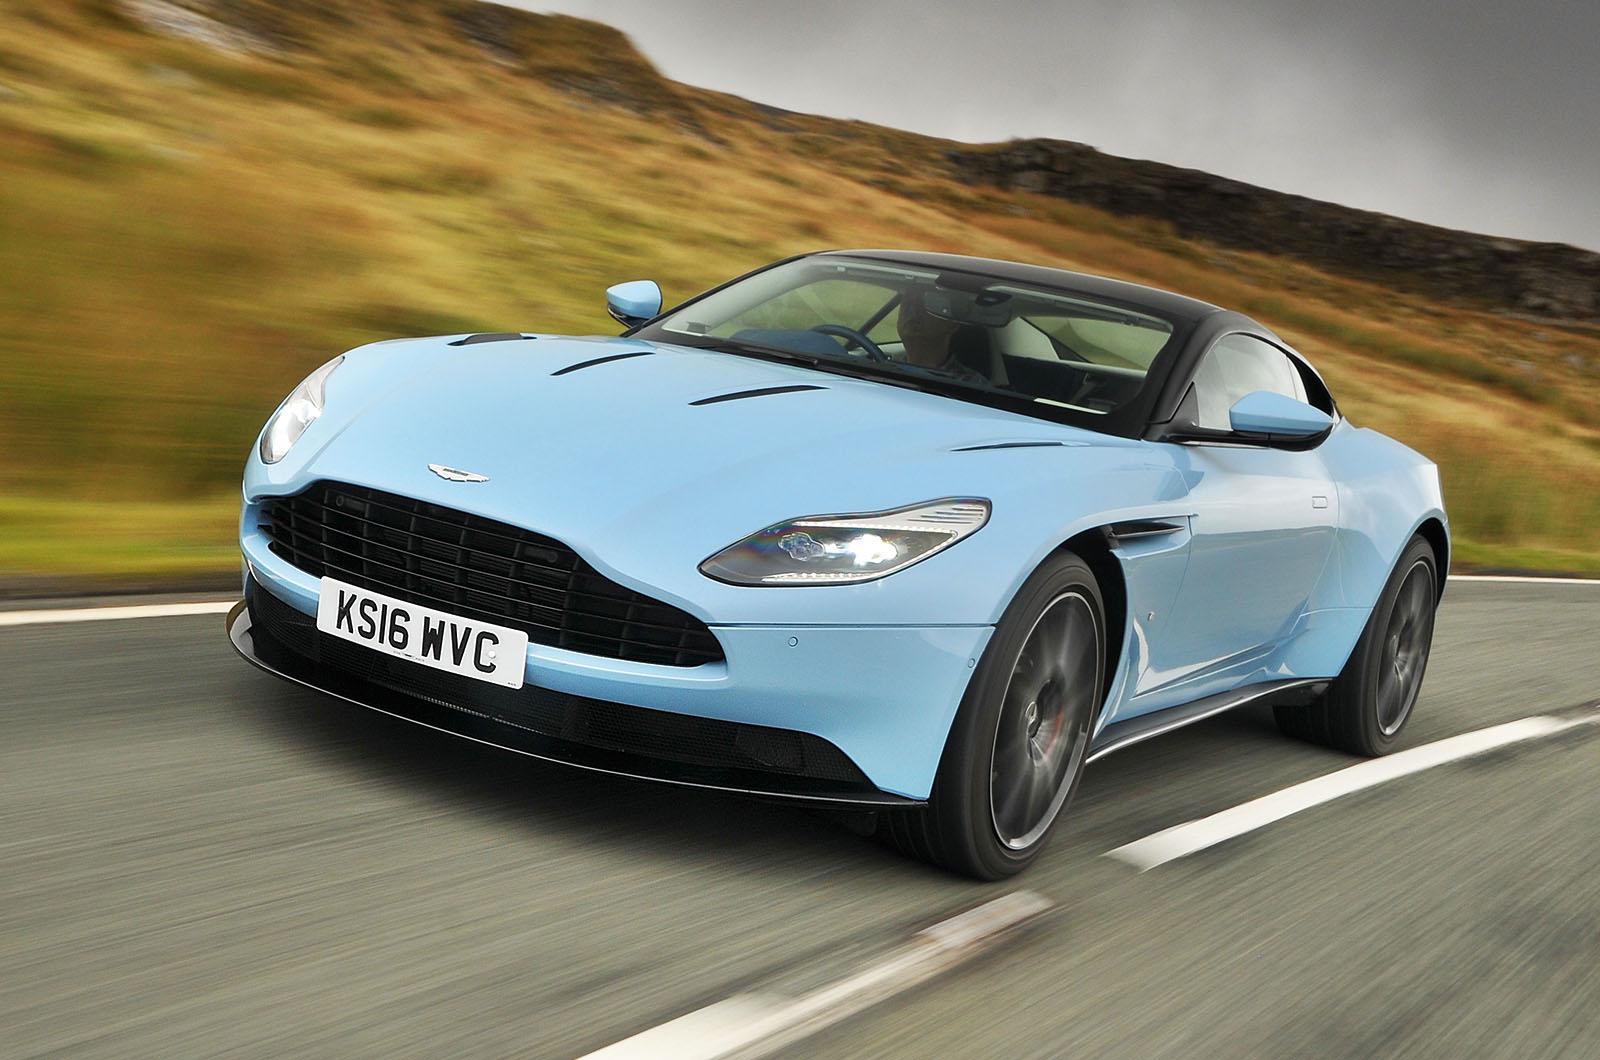 Aston Martin Db11 Review 2021 Autocar